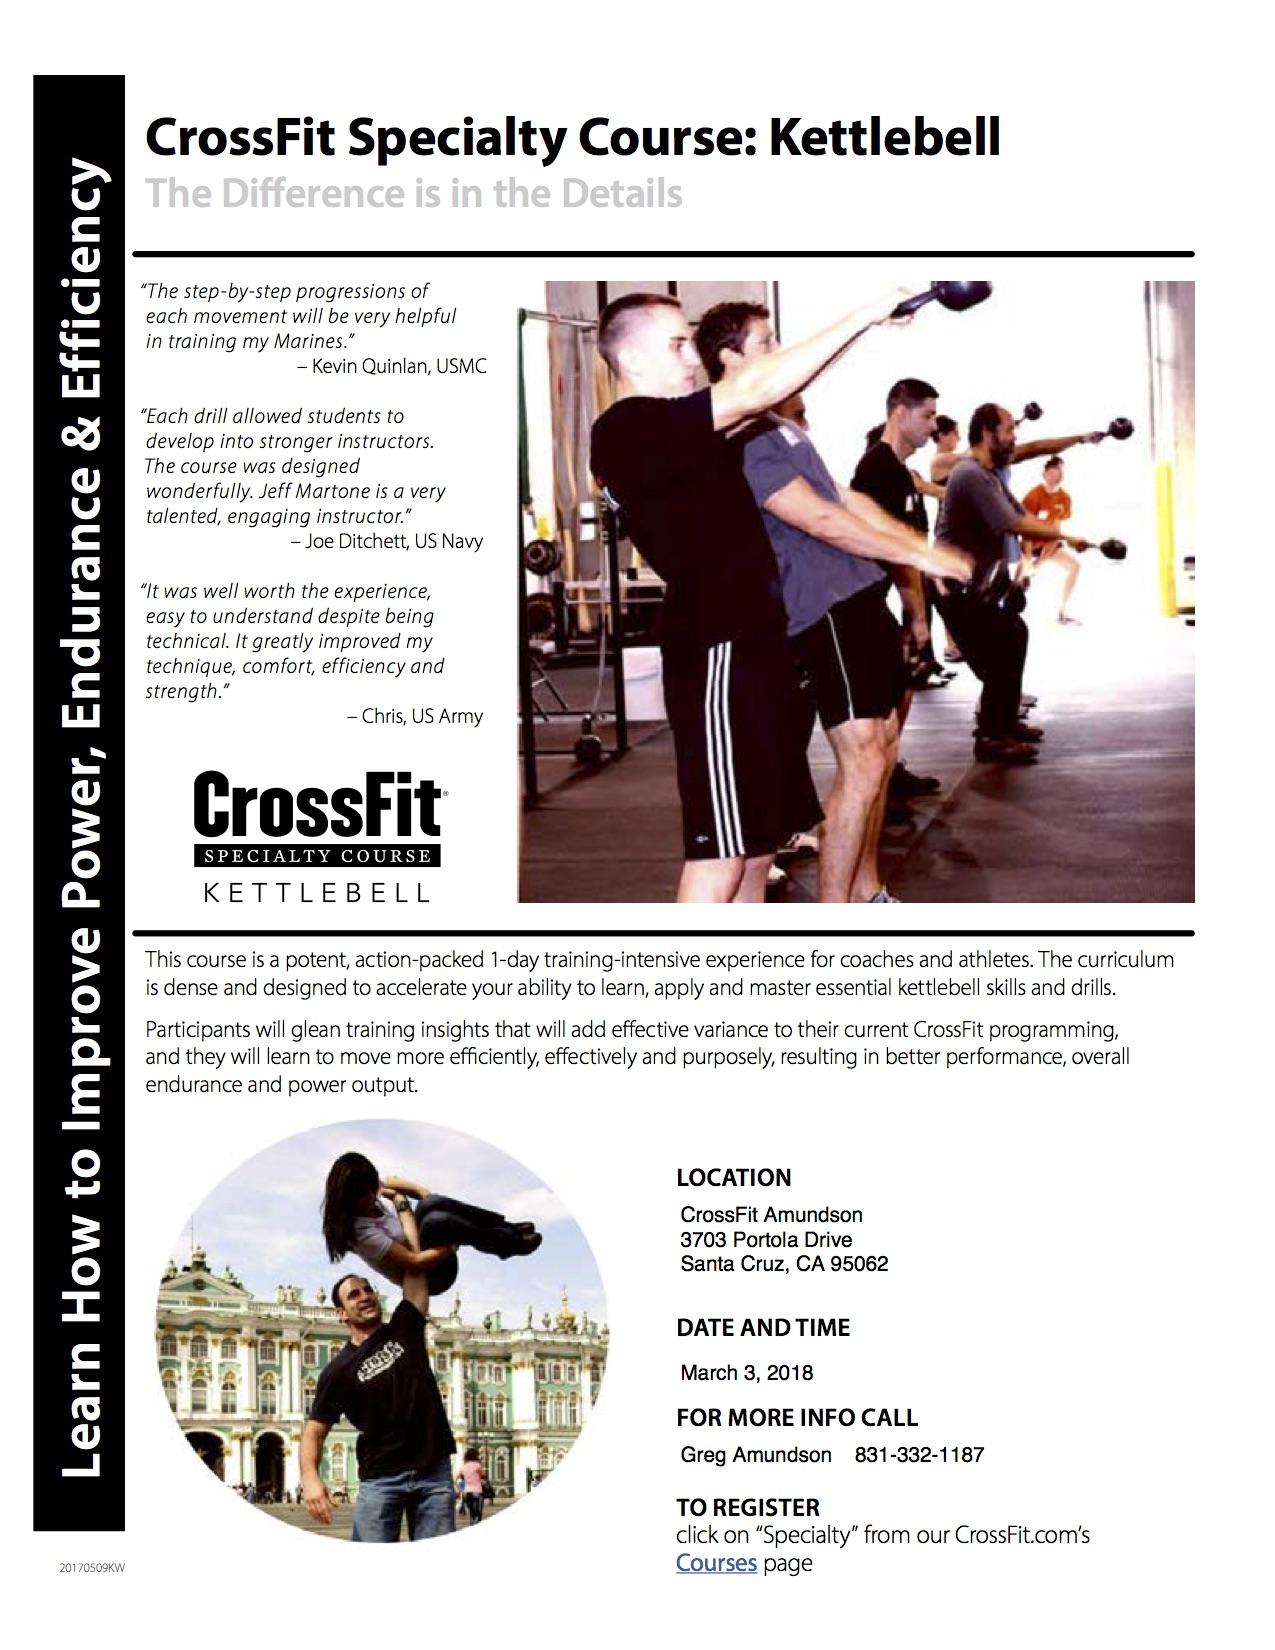 CrossFit Kettlebell 1-Day Course Flyer - Santa Cruz 2018.jpg